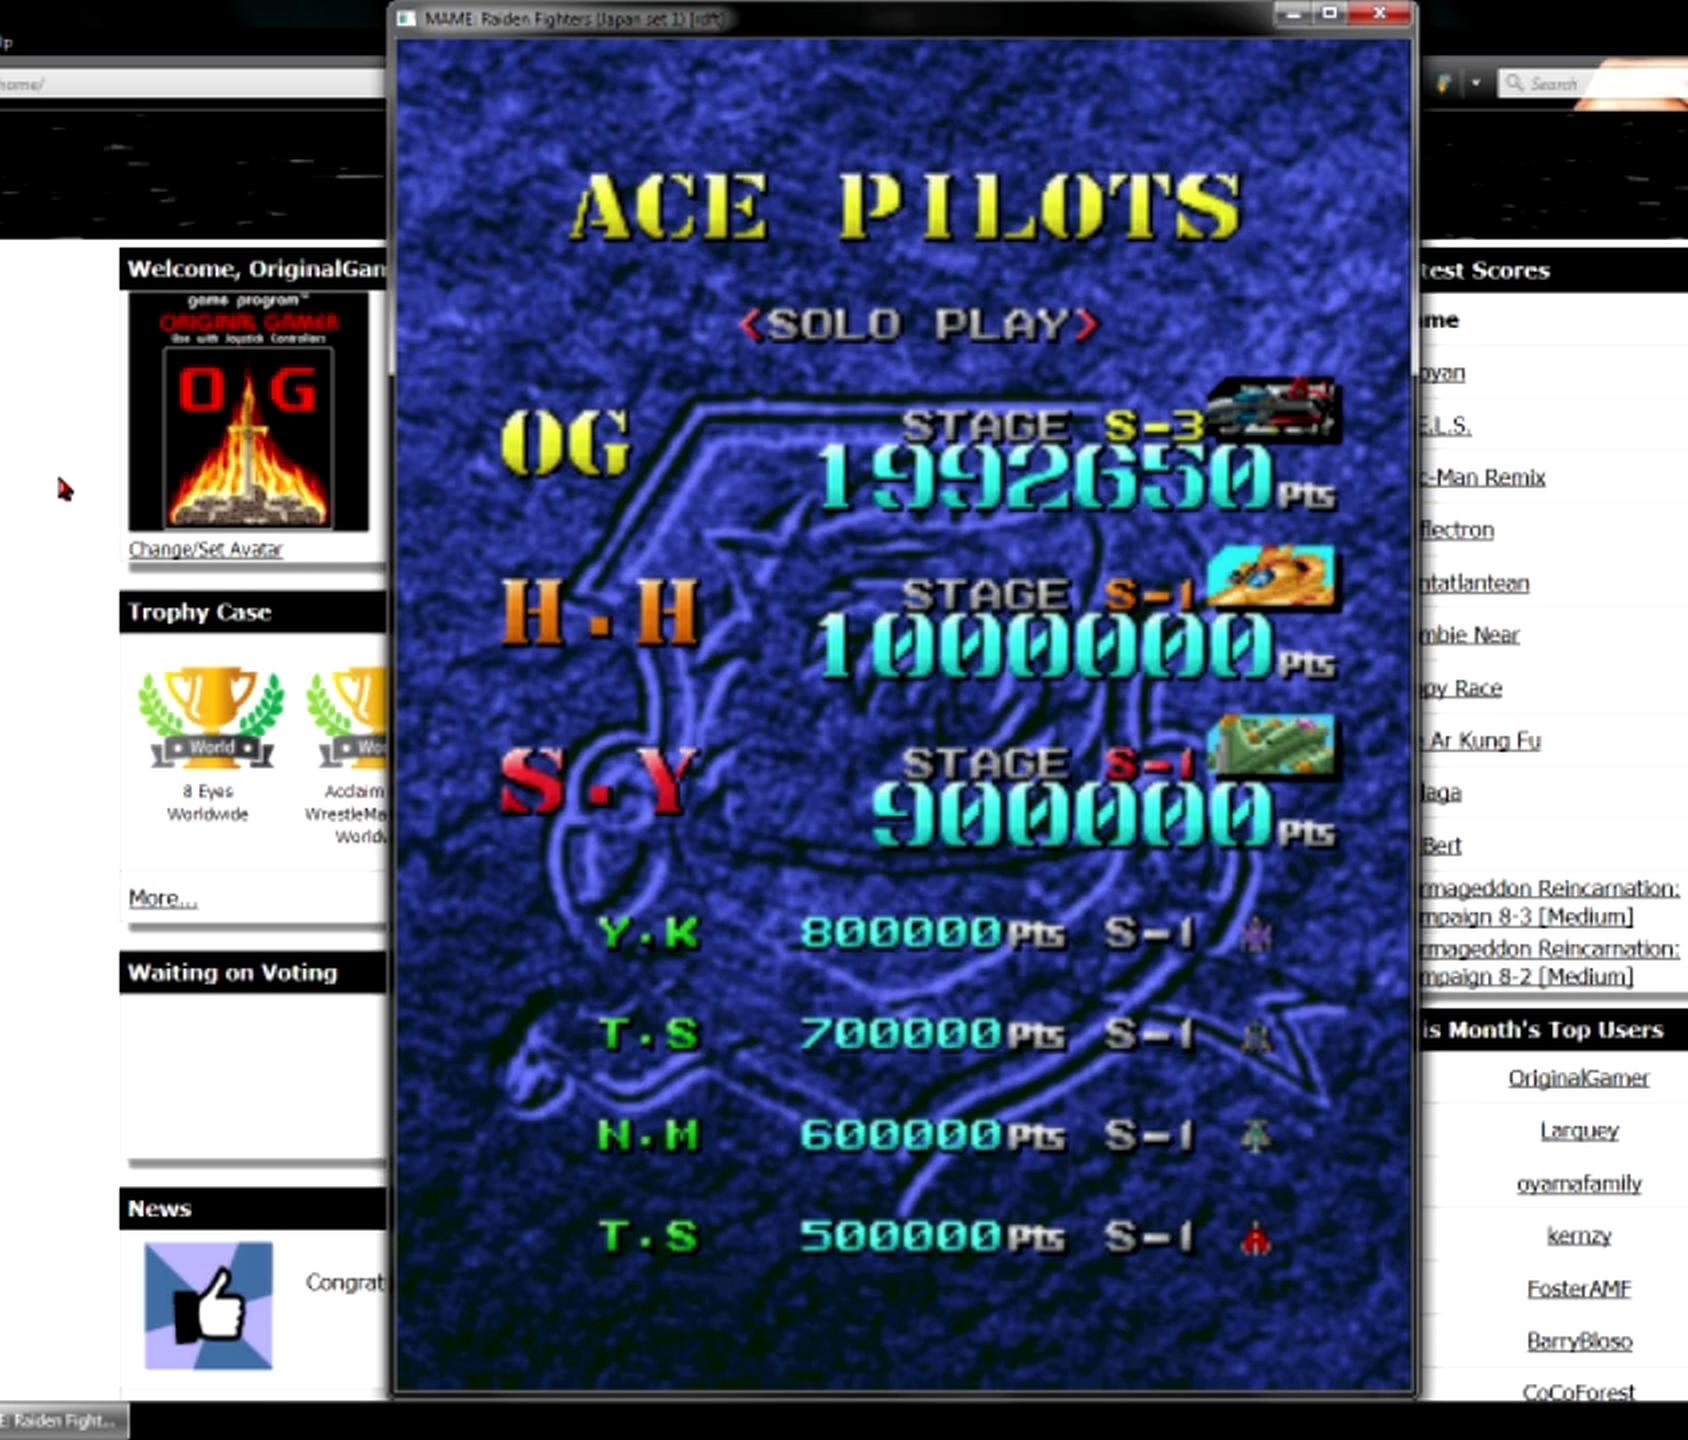 OriginalGamer: Raiden Fighters [rdft] (Arcade Emulated / M.A.M.E.) 1,992,650 points on 2015-05-30 23:49:33